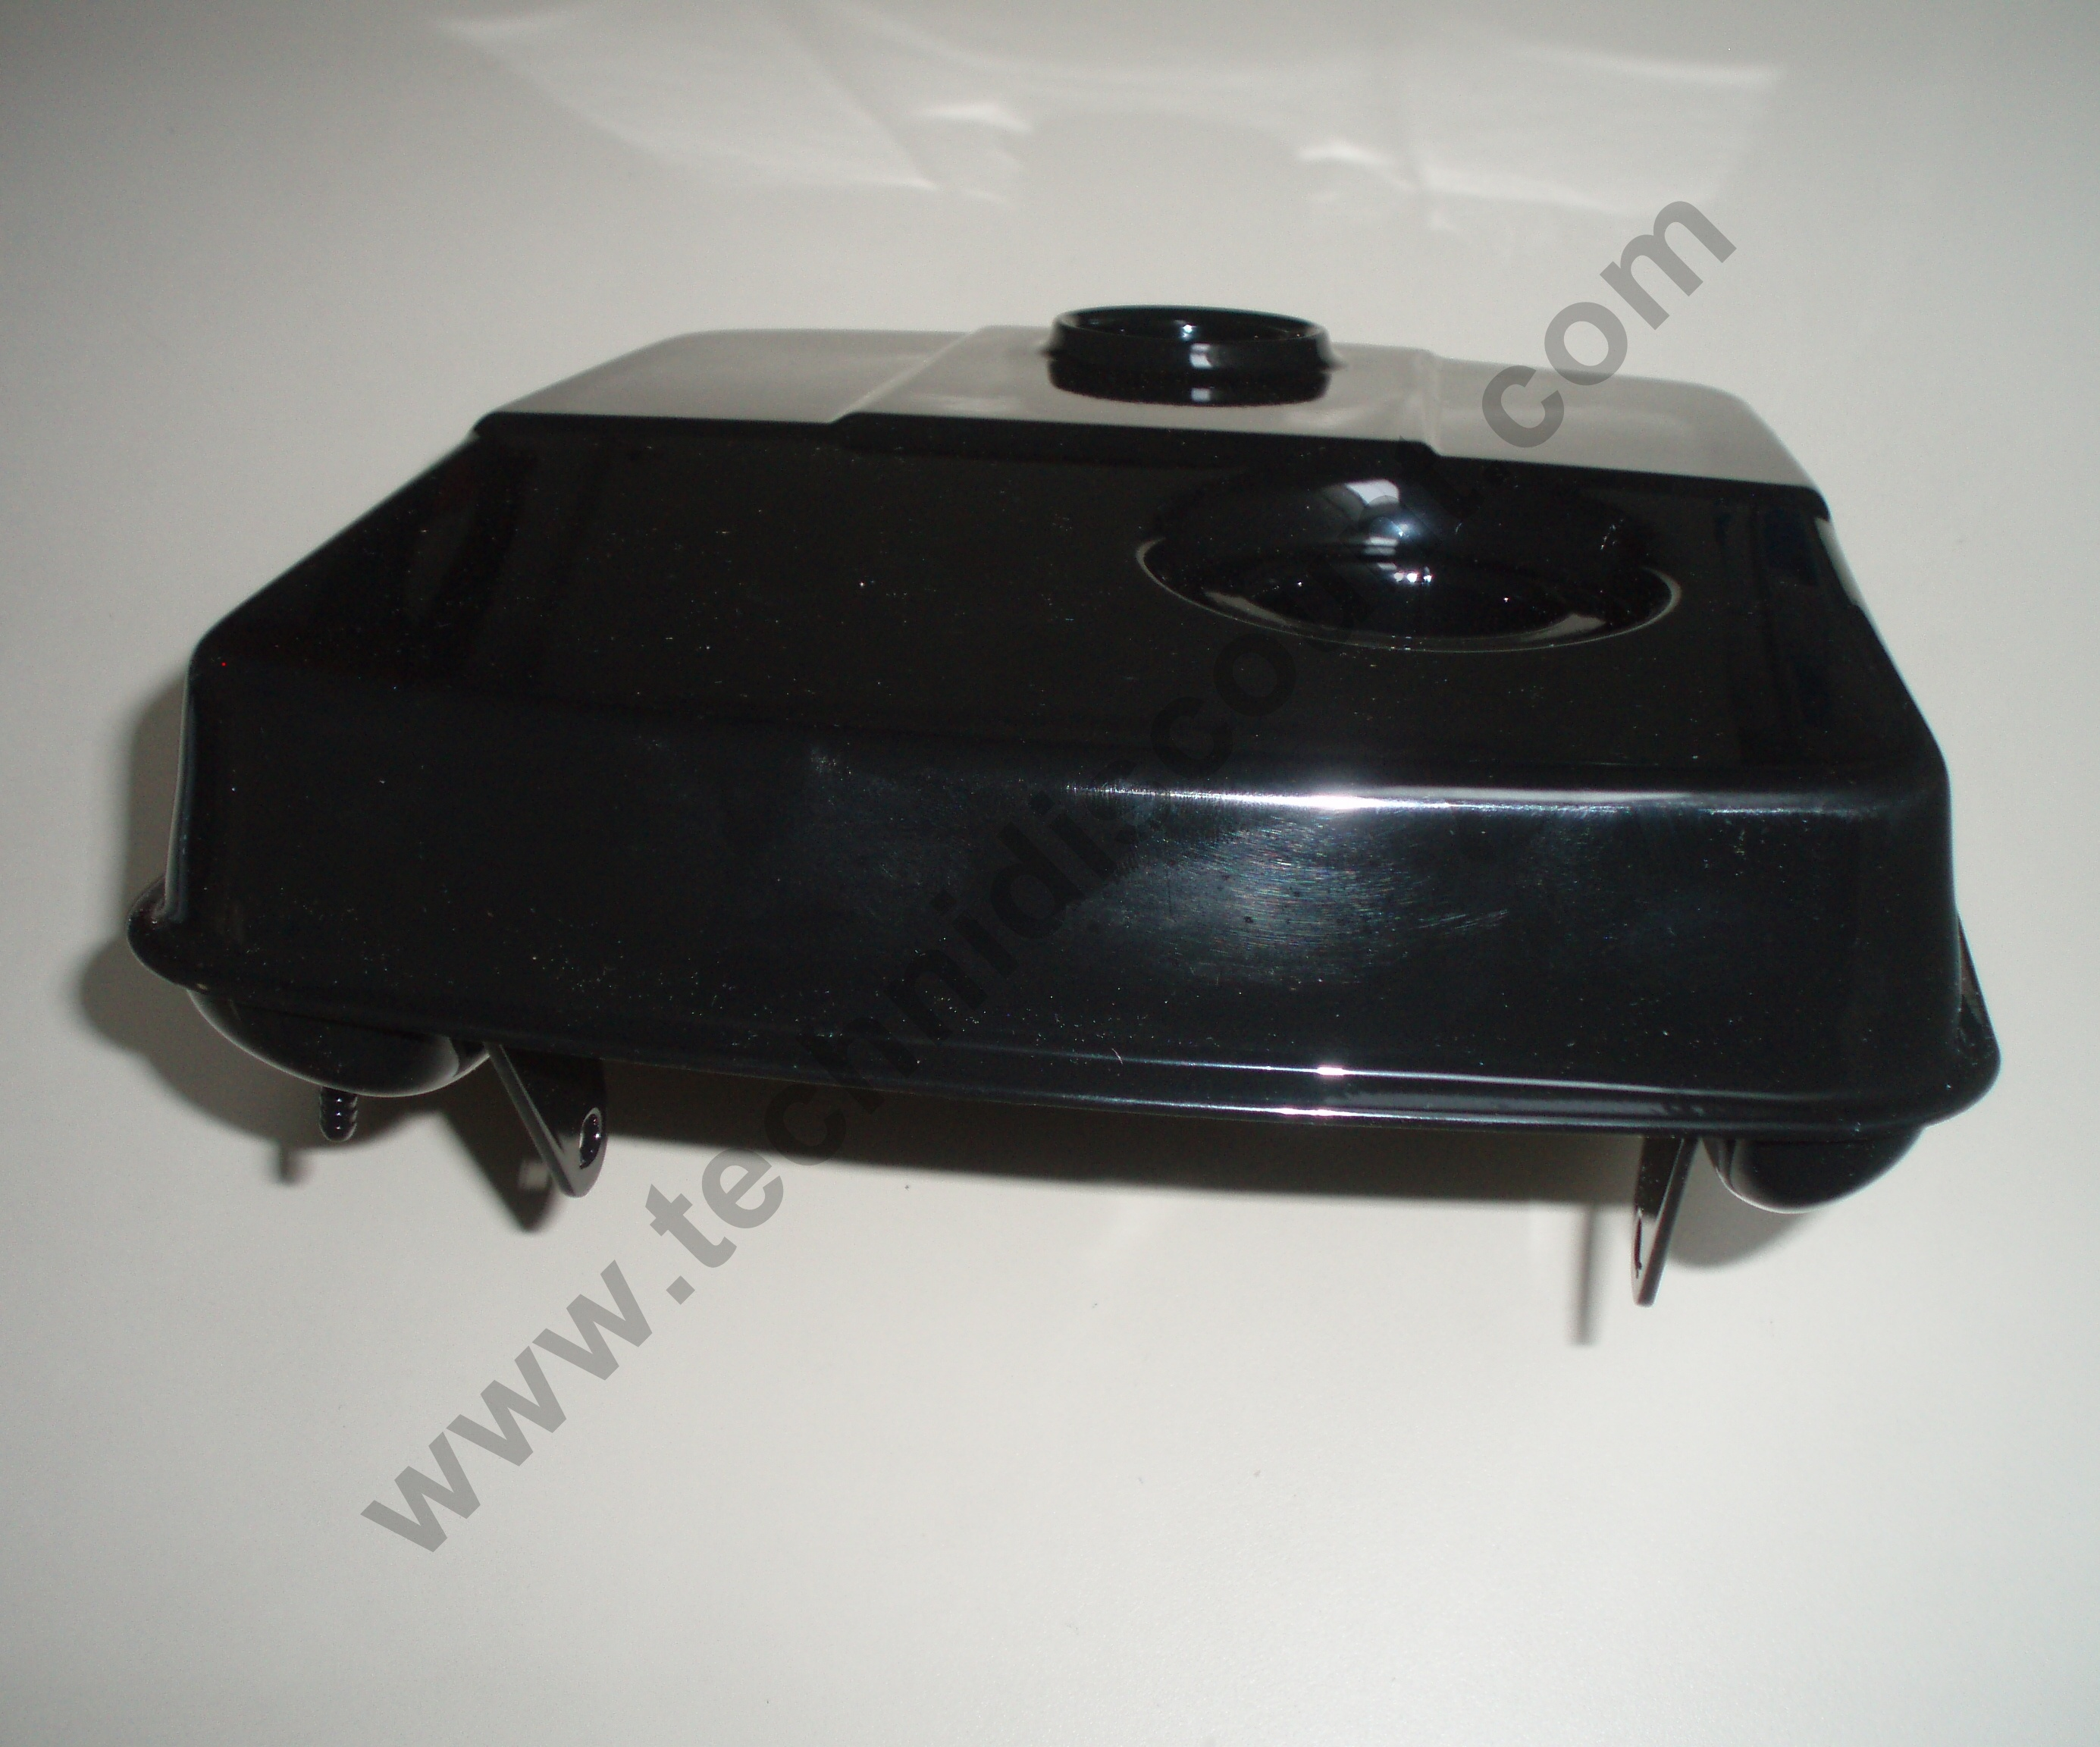 Reservoir essence IM250 IM300 IM350 IM359 LOMBARDINI 2 sorties 8103272 / ED0081032720-S